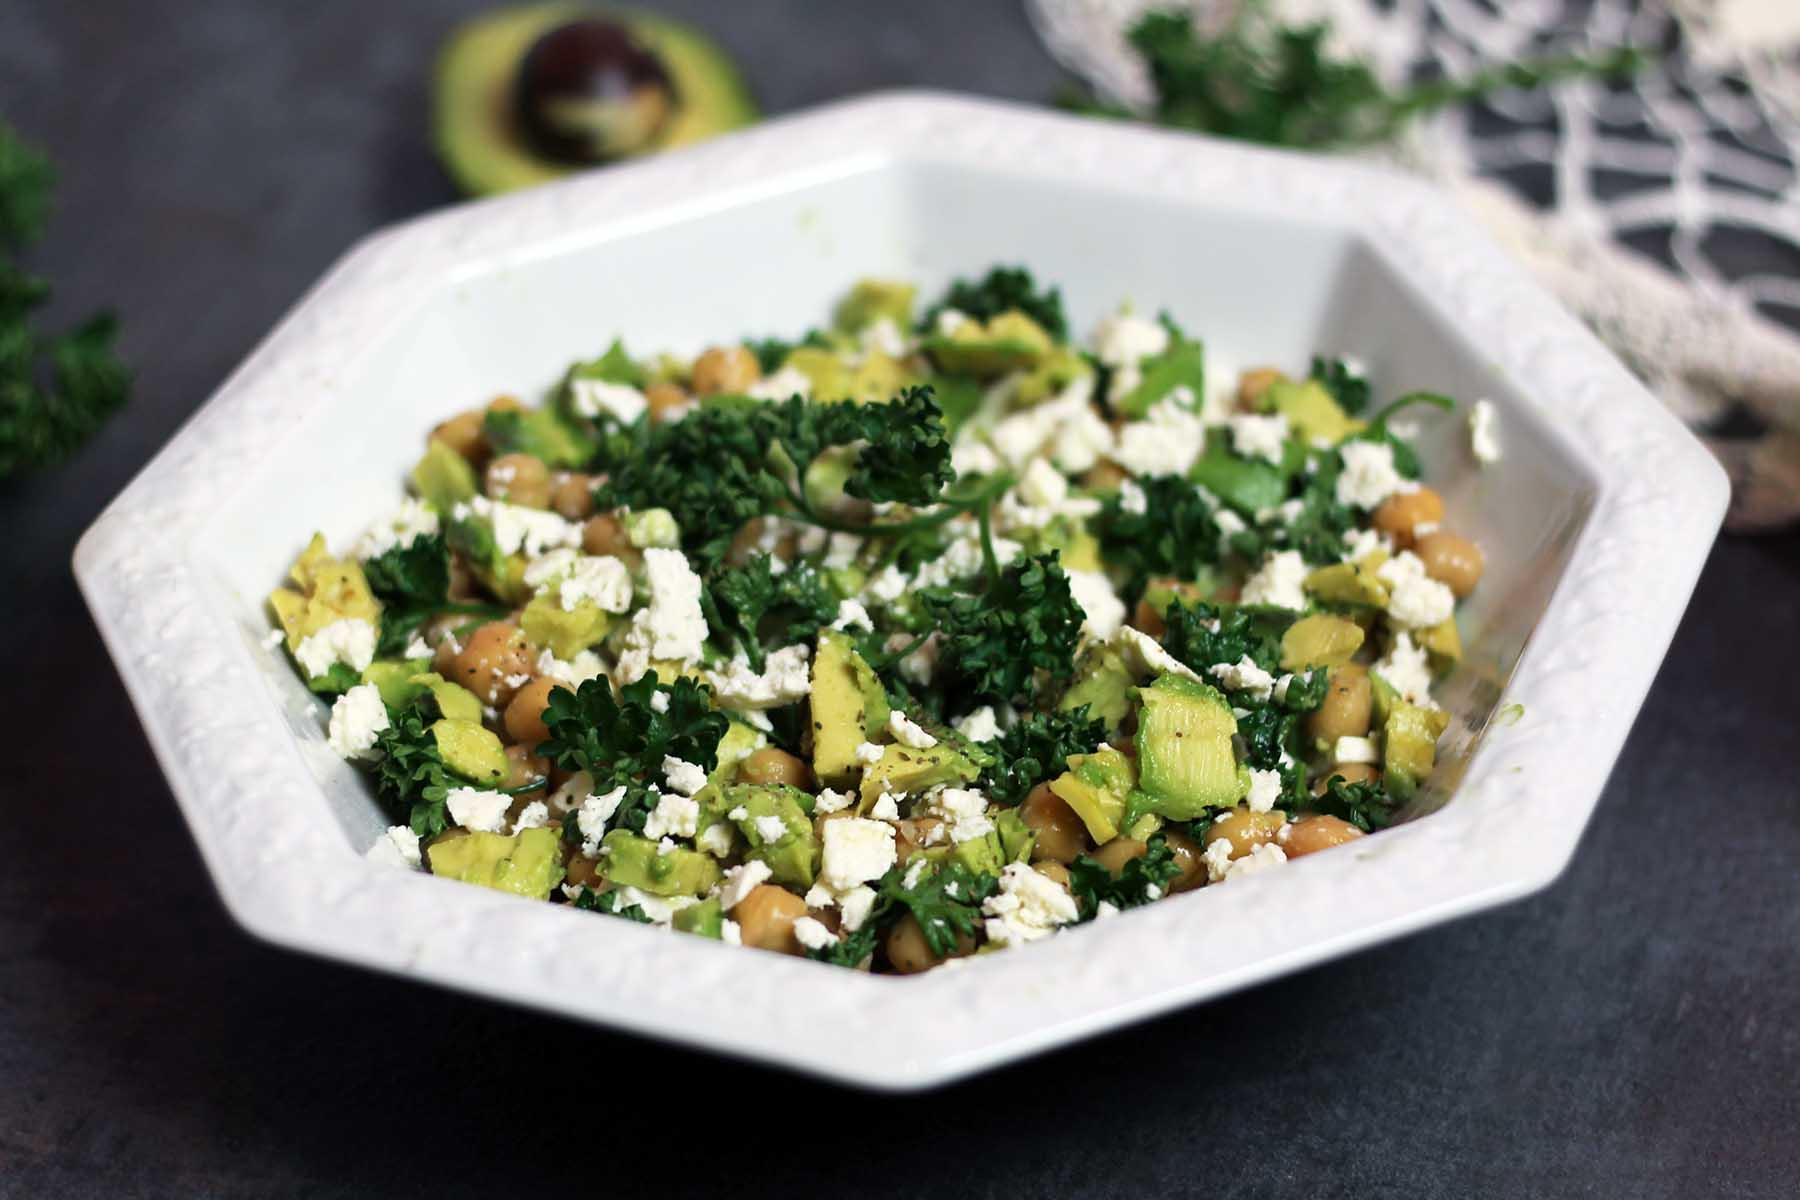 gesund-essen-salat-avocado-rezept-kichererbsen-foodblog-fitness